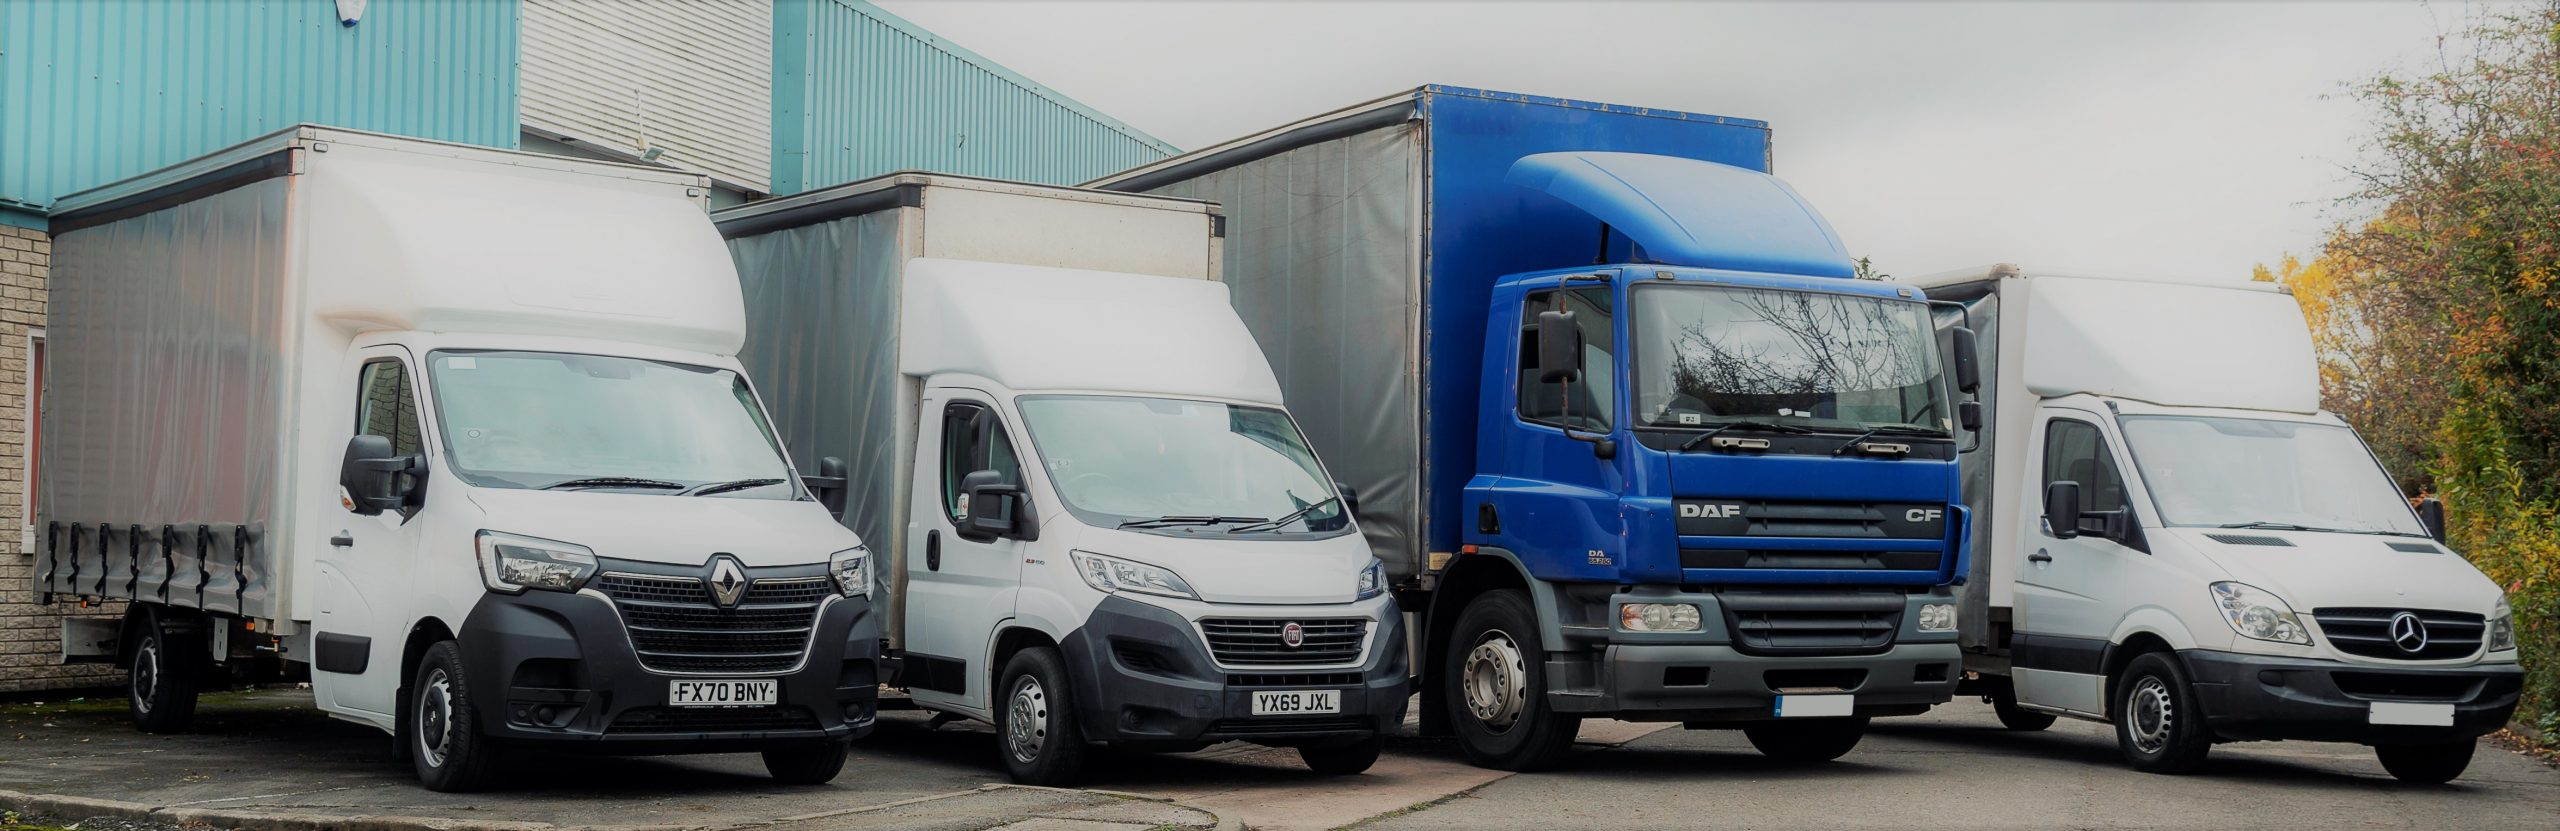 S L Packaging & Transport Transport Fleet